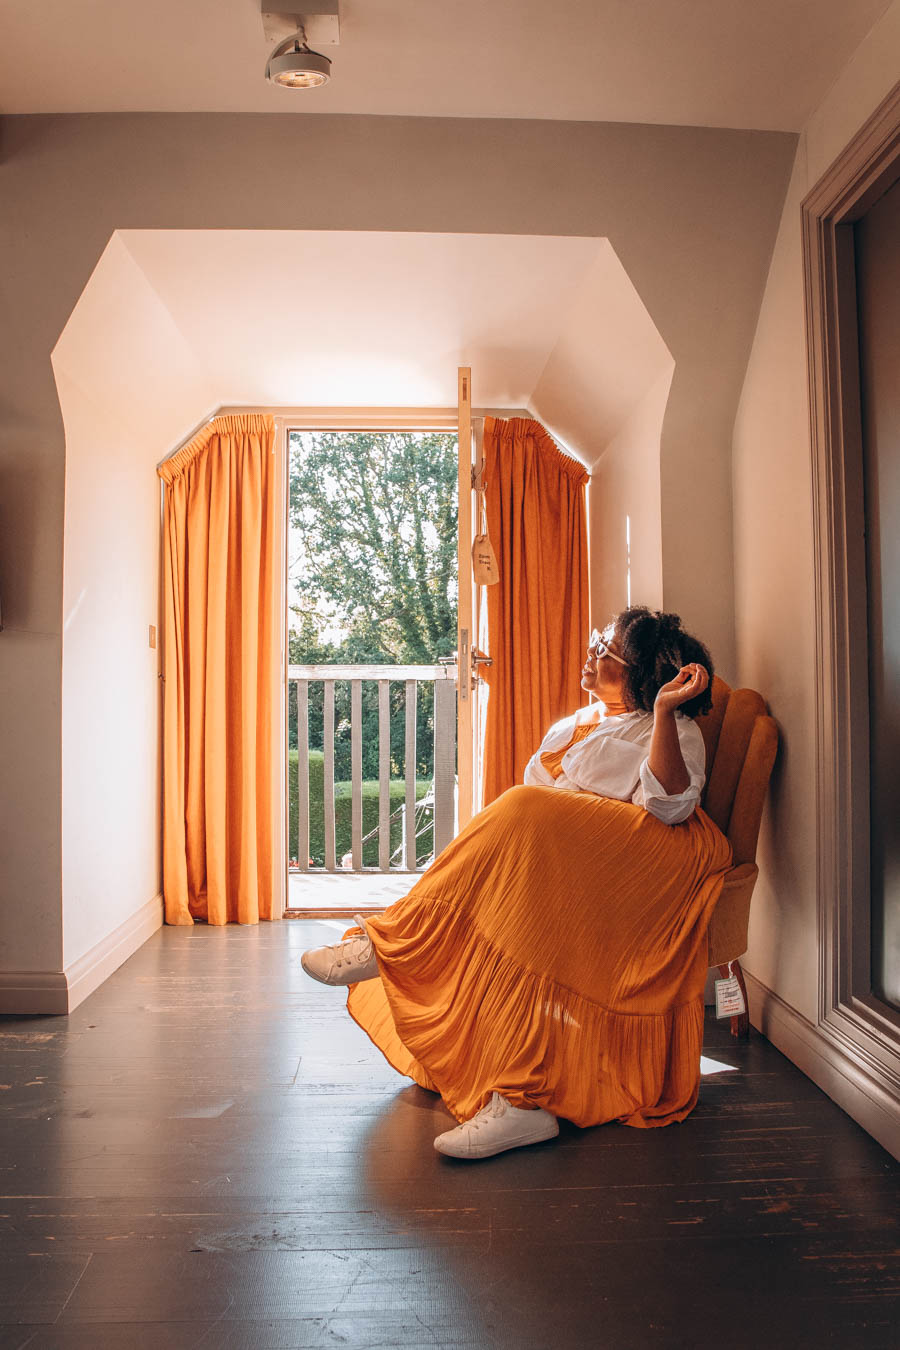 Eulanda wearing orange skirt sitting in doorway of room at The Old House Inn, Copthorne   West Sussex